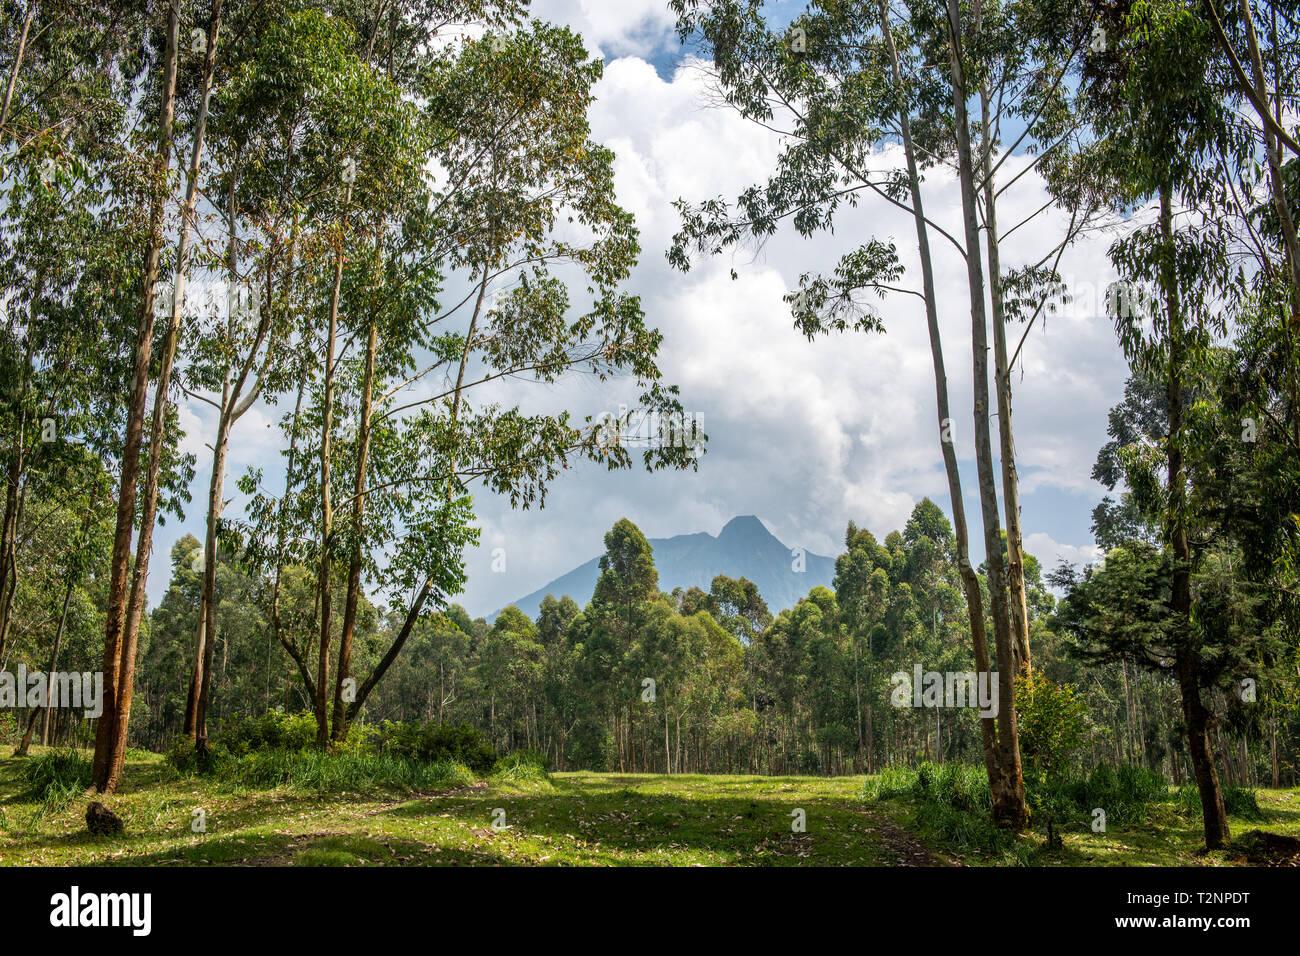 Eucalyptus grove with Mount Sabyinyo volcano looming in the distance, Kinigi, Rwanda Stock Photo